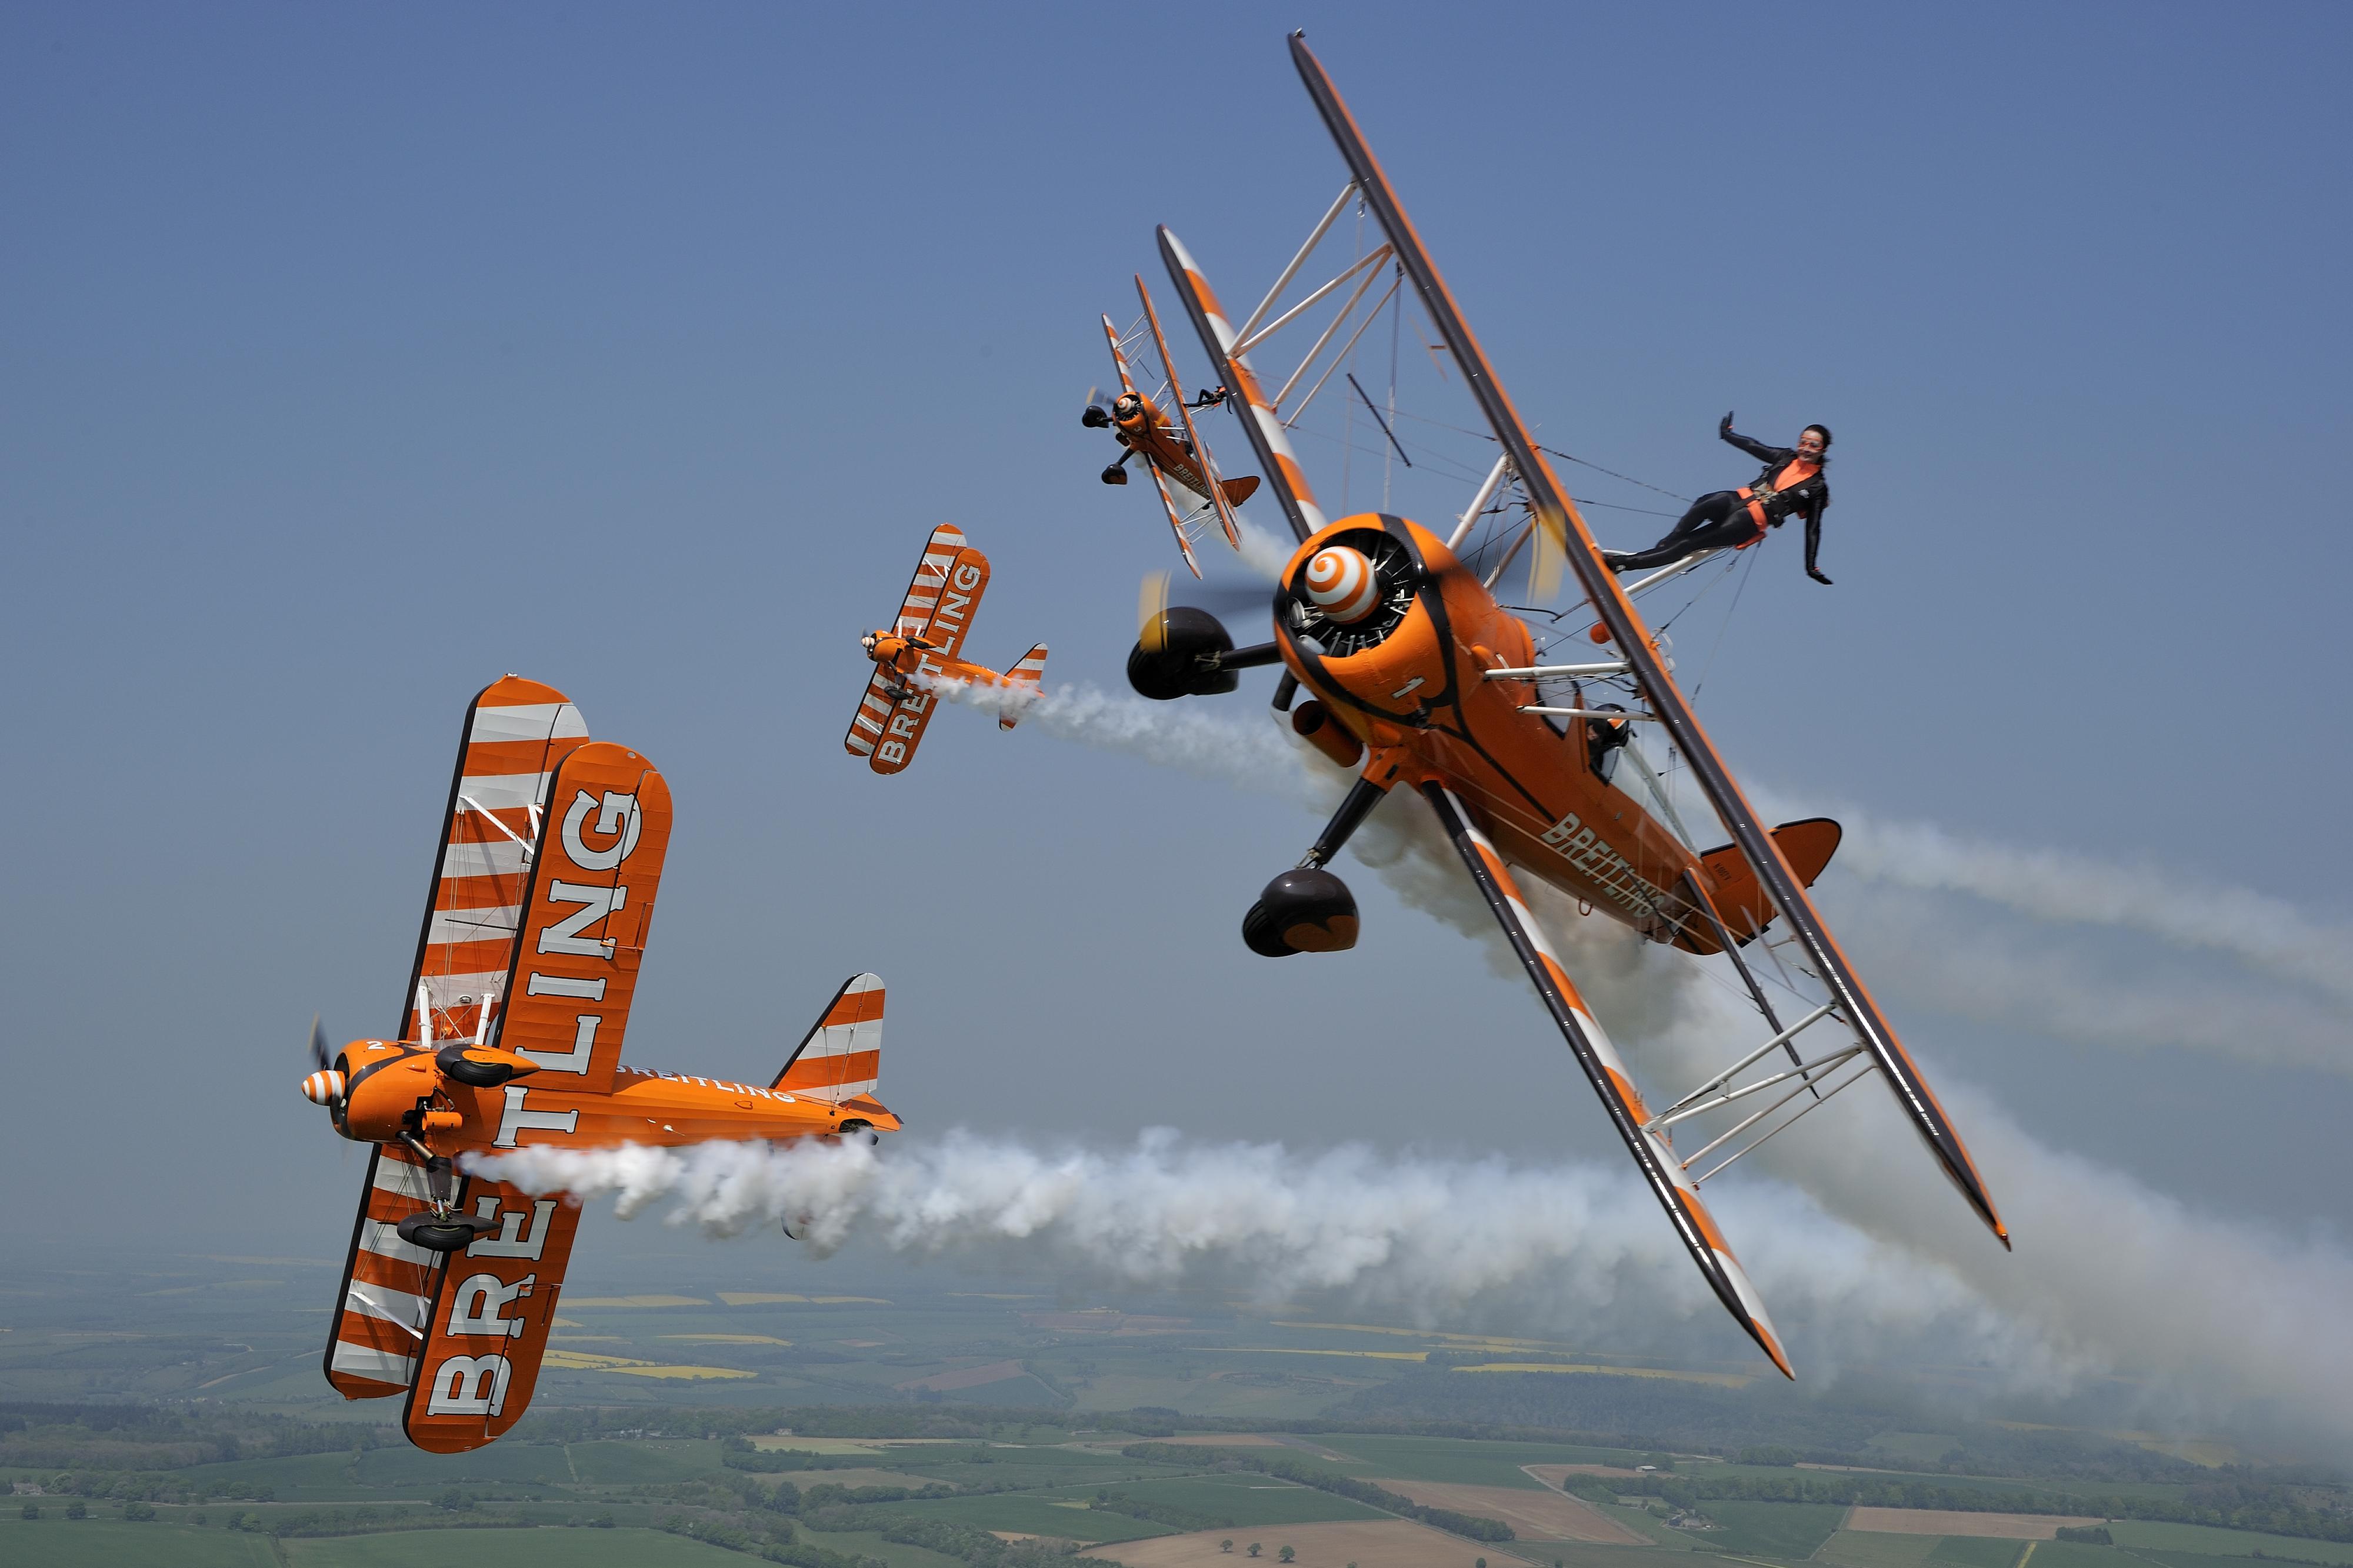 The Breilting Wingwalkers aerobatic display team © Tokunaga